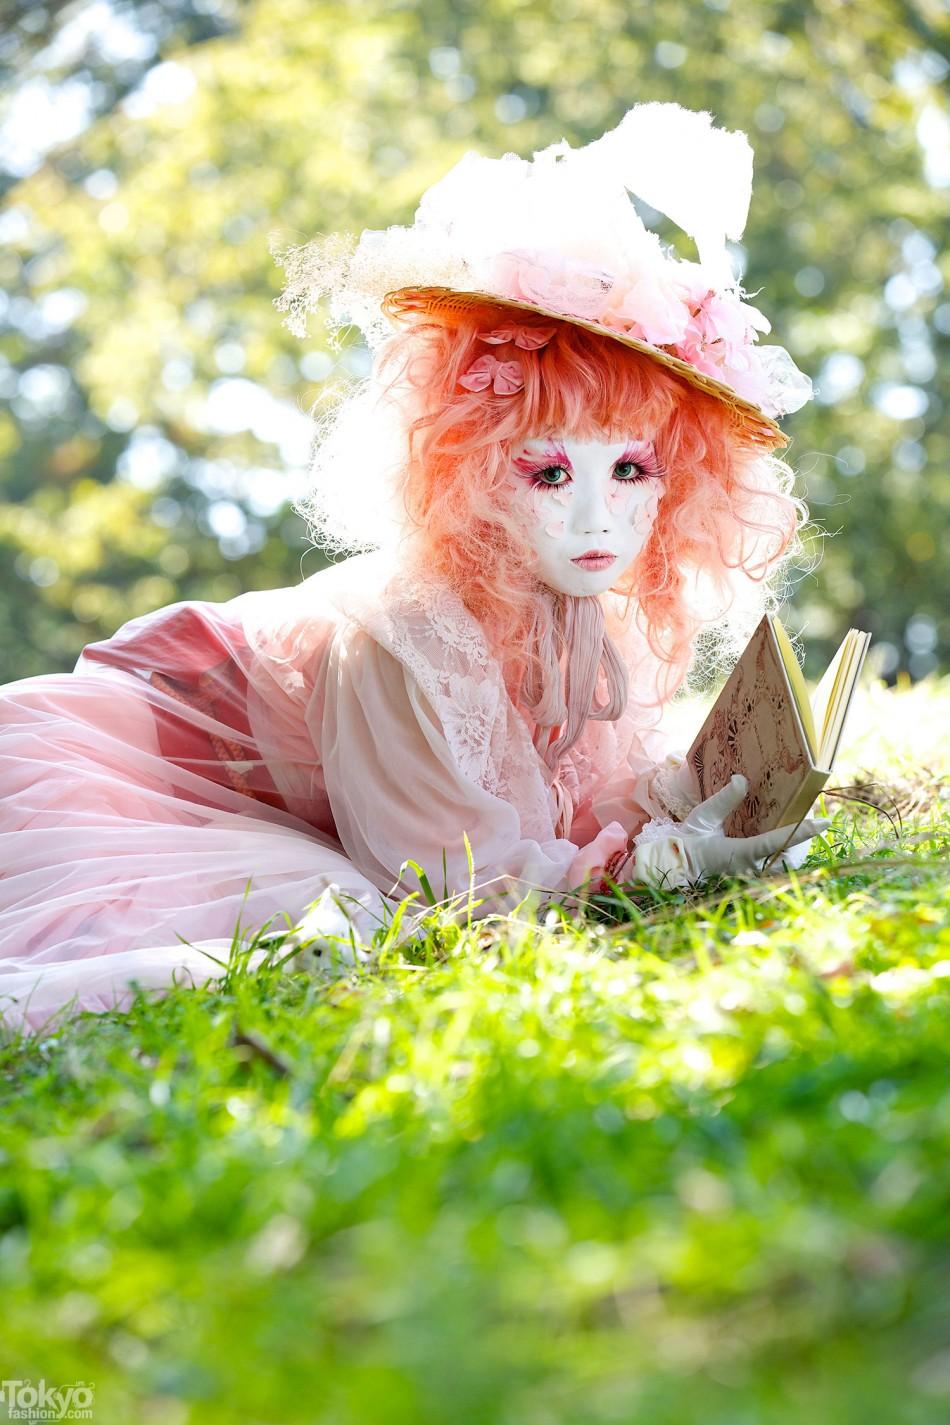 Minori - Her Memories of a Dream (38)